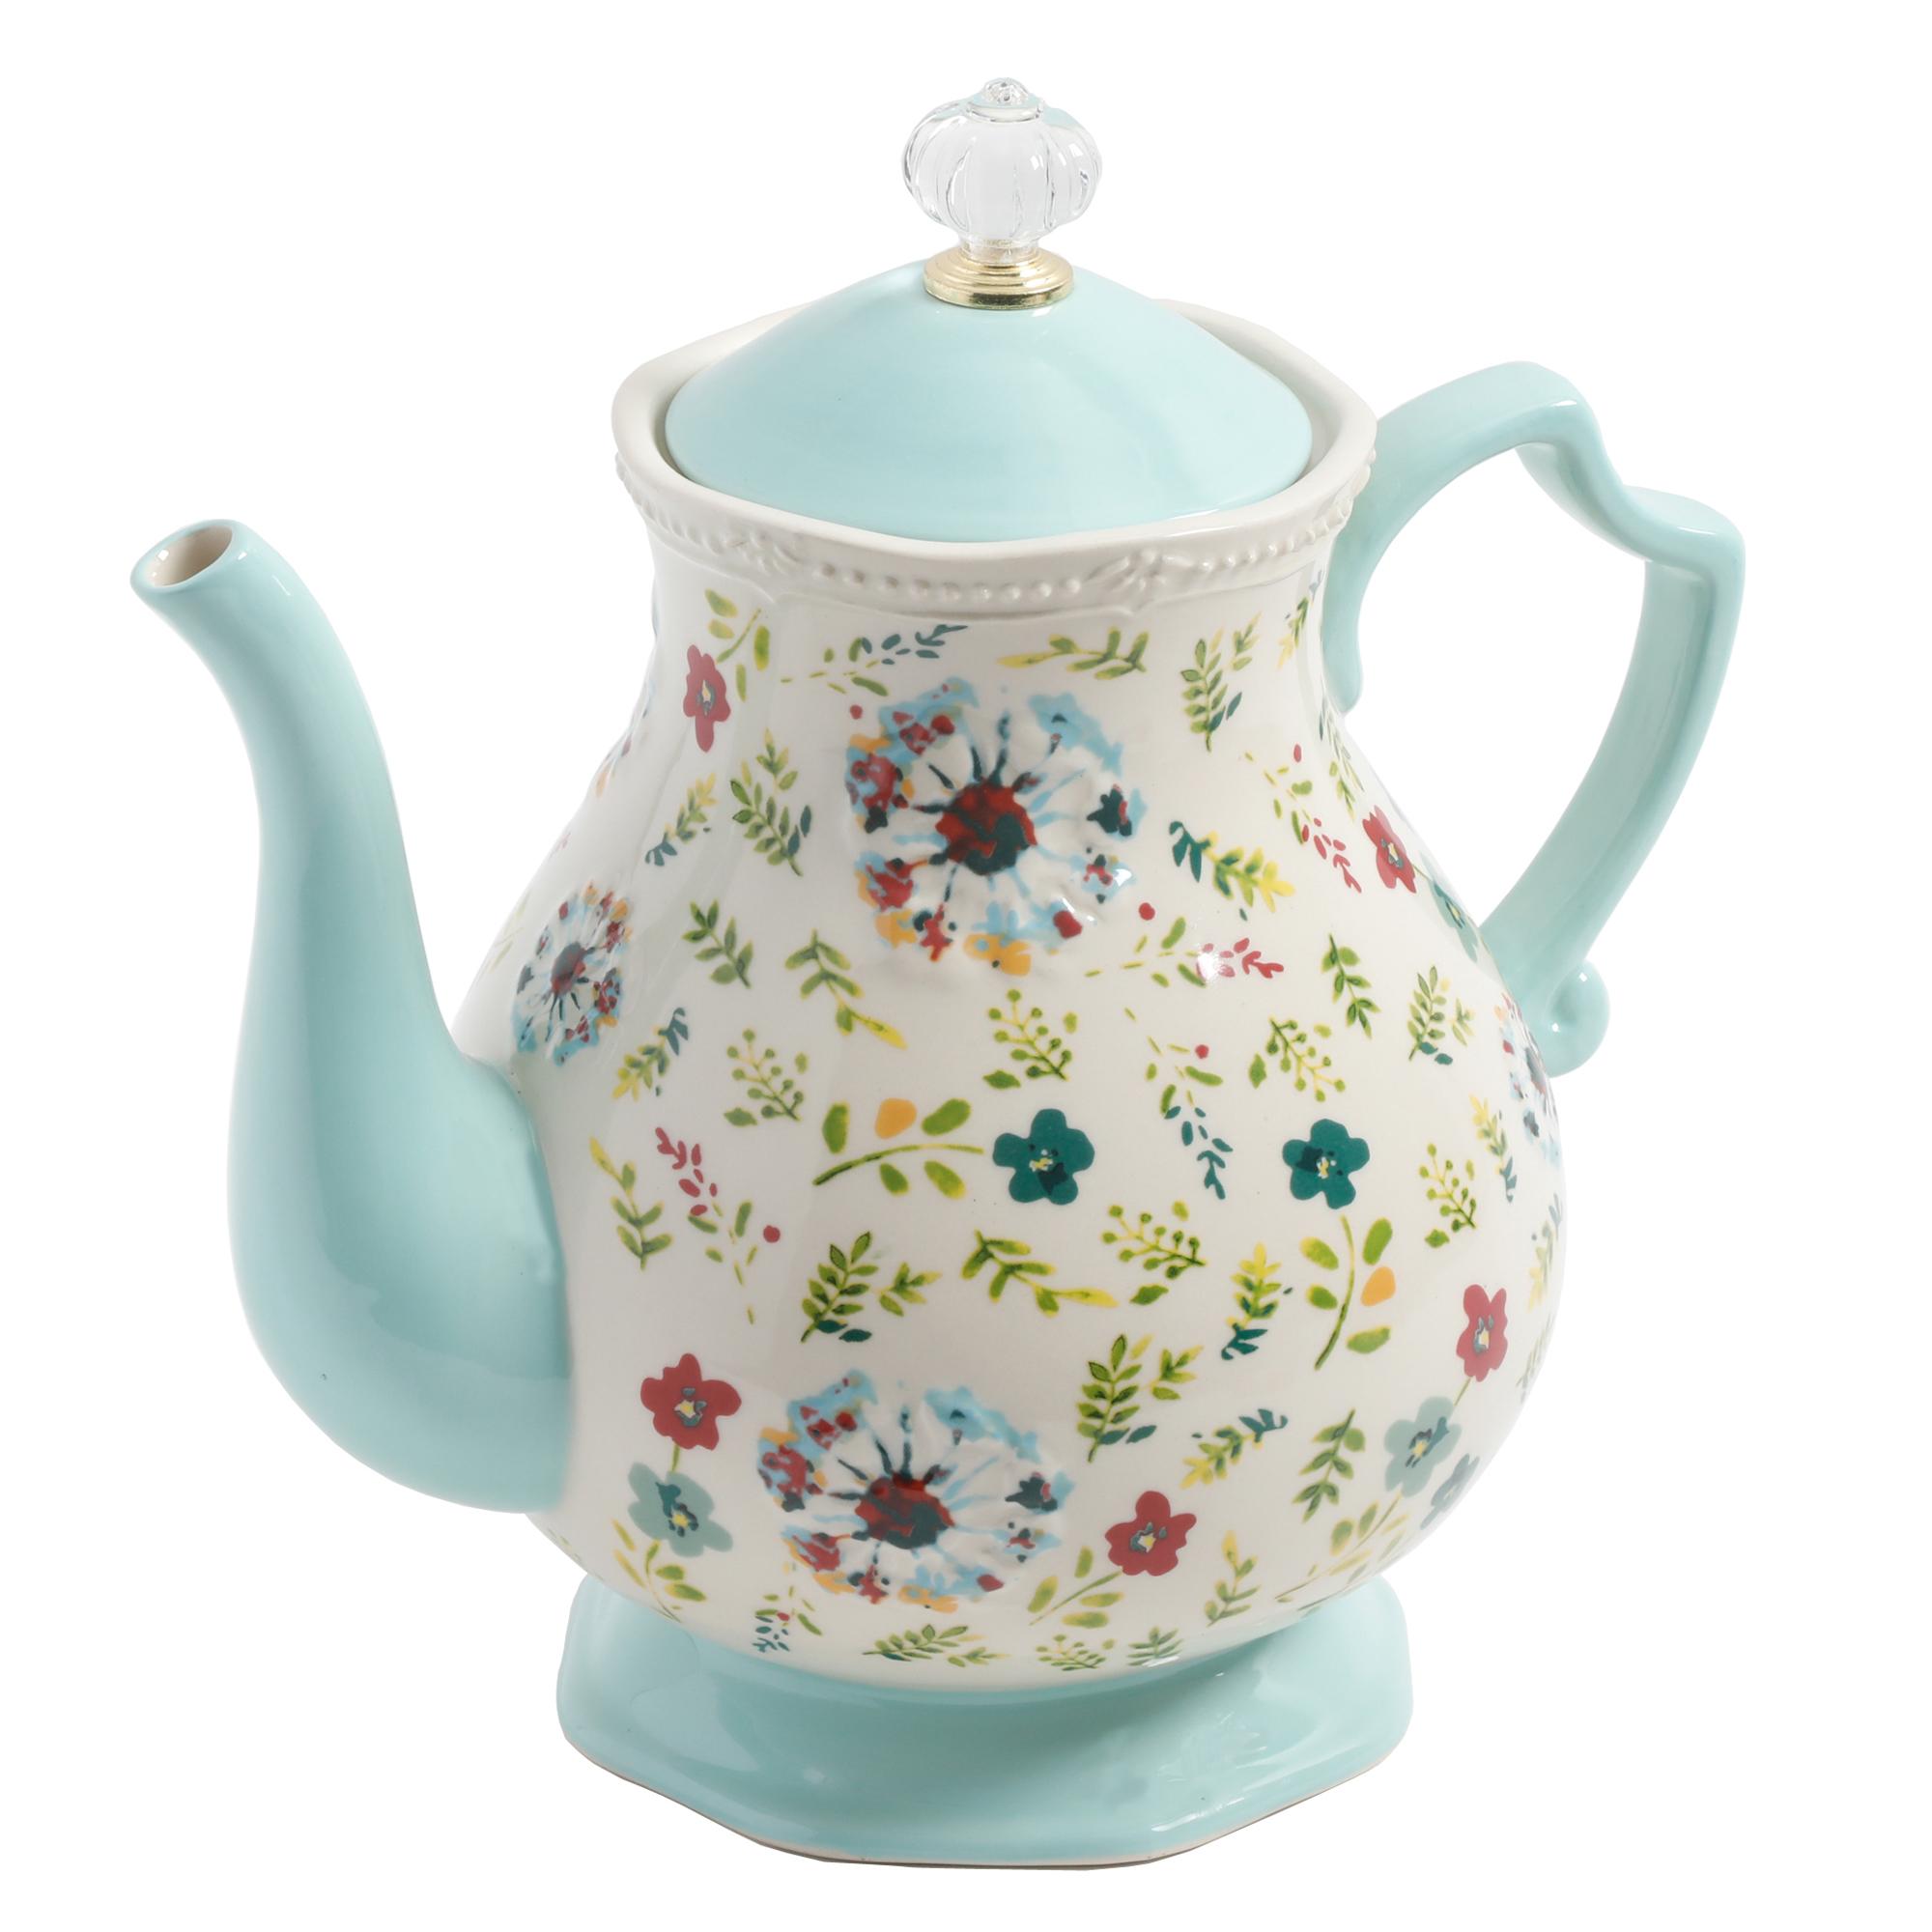 Beige 6 Cup Teapot cer/ámica Tetera de Royal Botanical Gardens